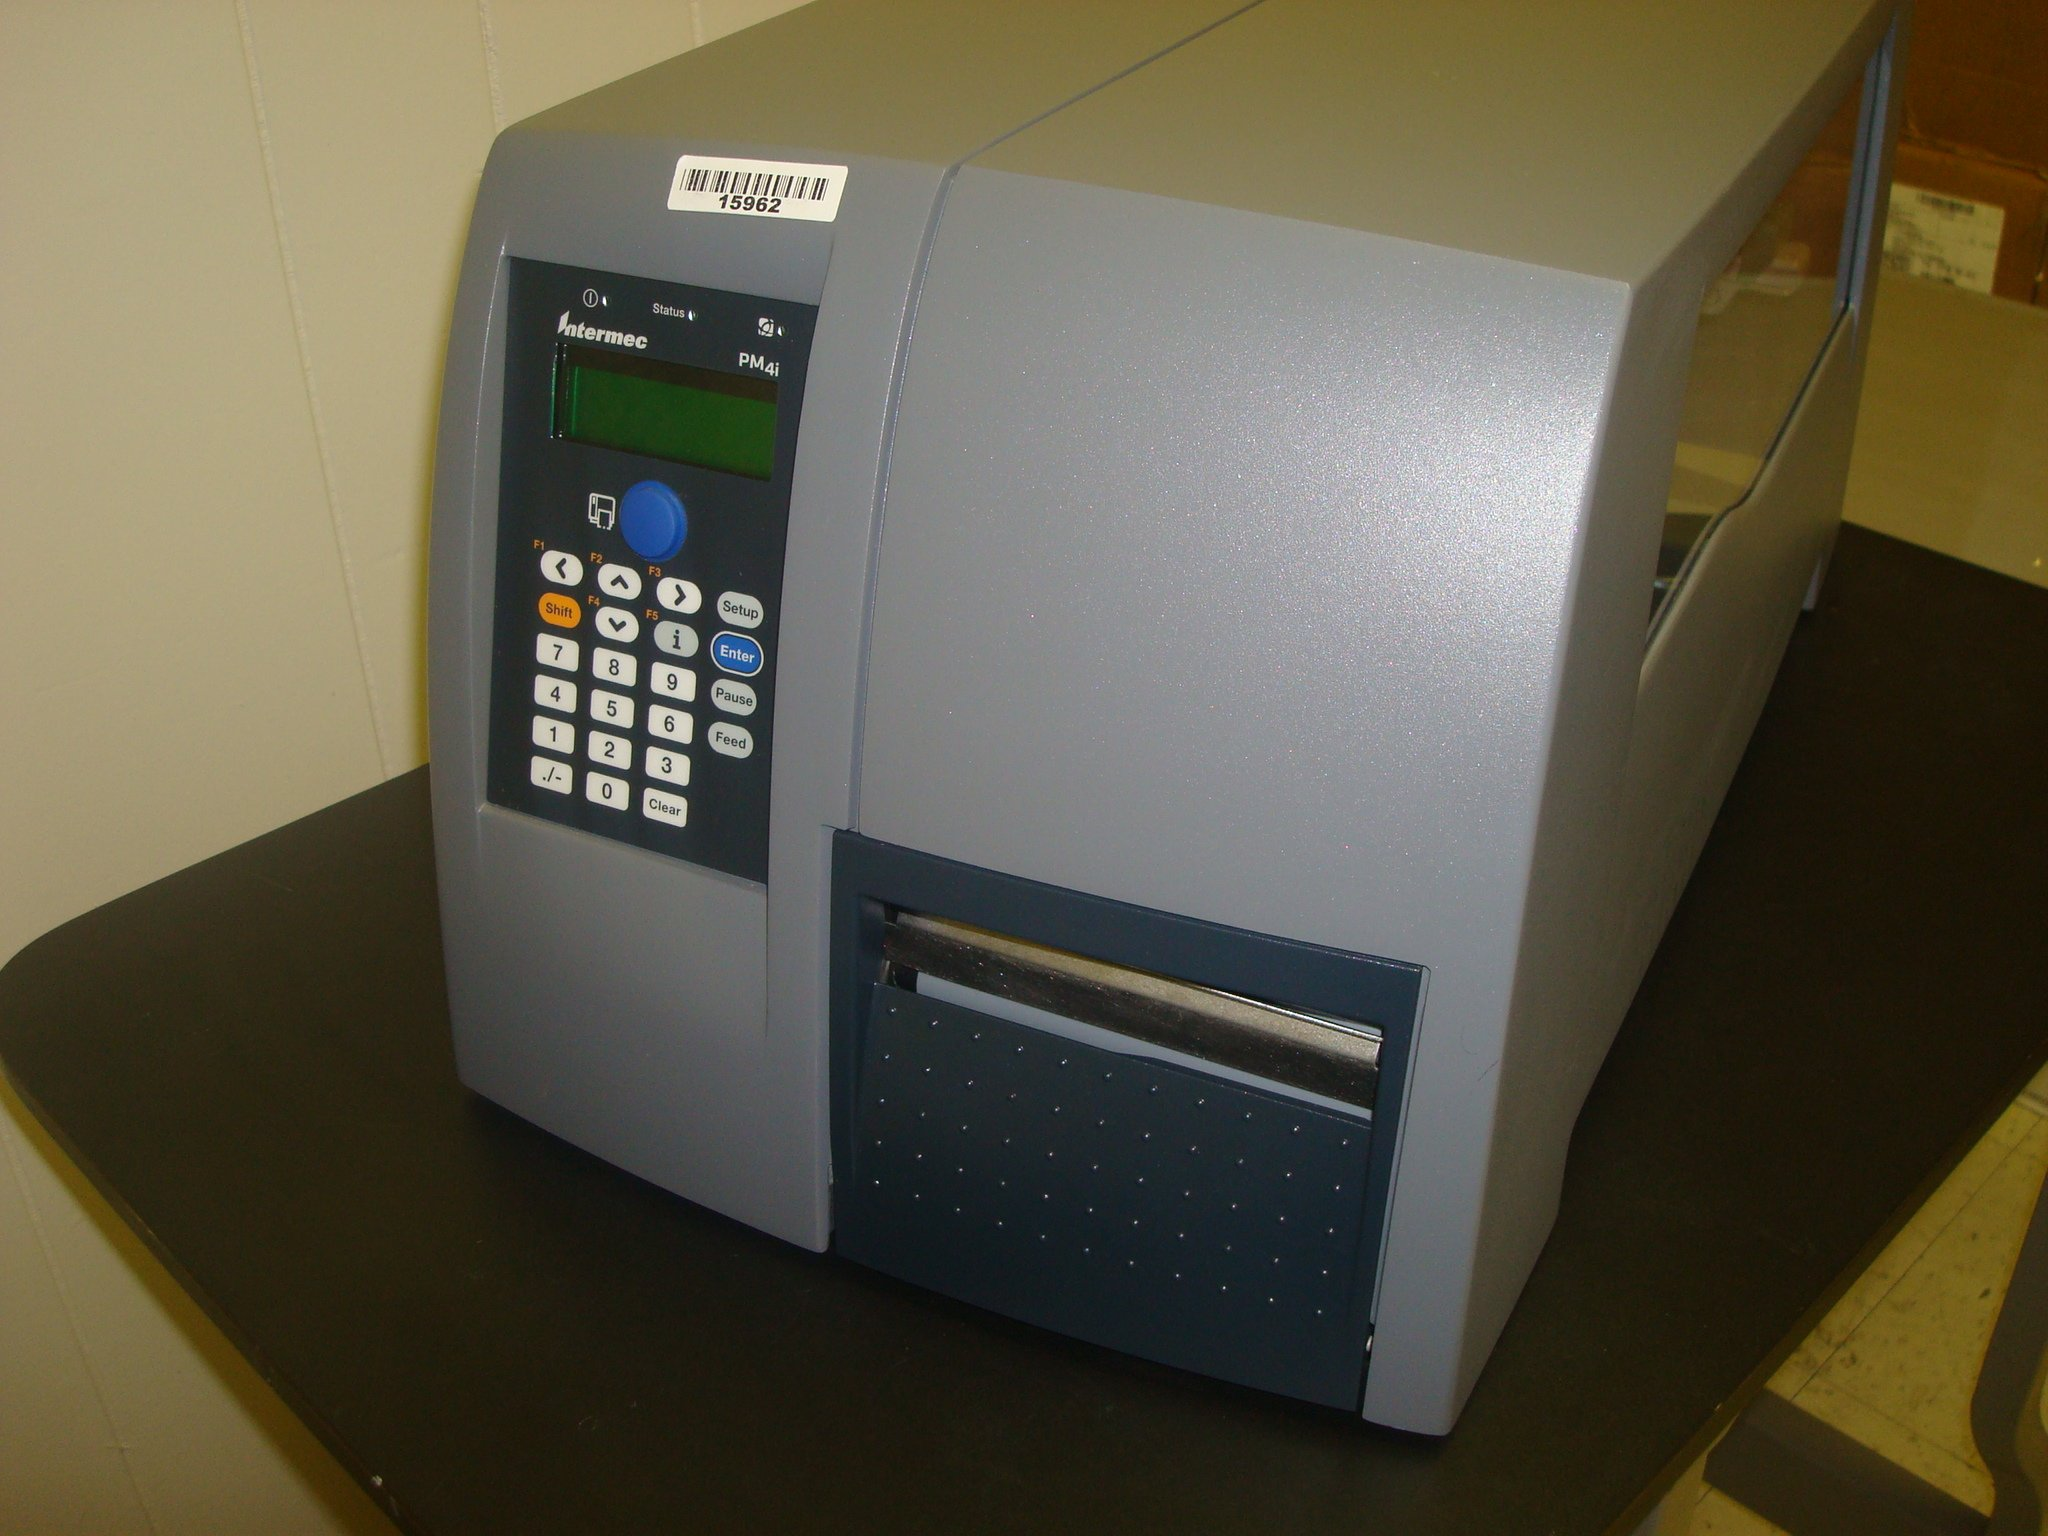 Intermec EasyCoder PM4i Direct Thermal/Thermal Transfer Printer - Monochrome - Desktop - Label Print. PTR/PM4I/WRLS/32+16/TT/203 BS-AC. 8 in/s Mono - 203dpi - Fast Ethernet - Wi-Fi - USB